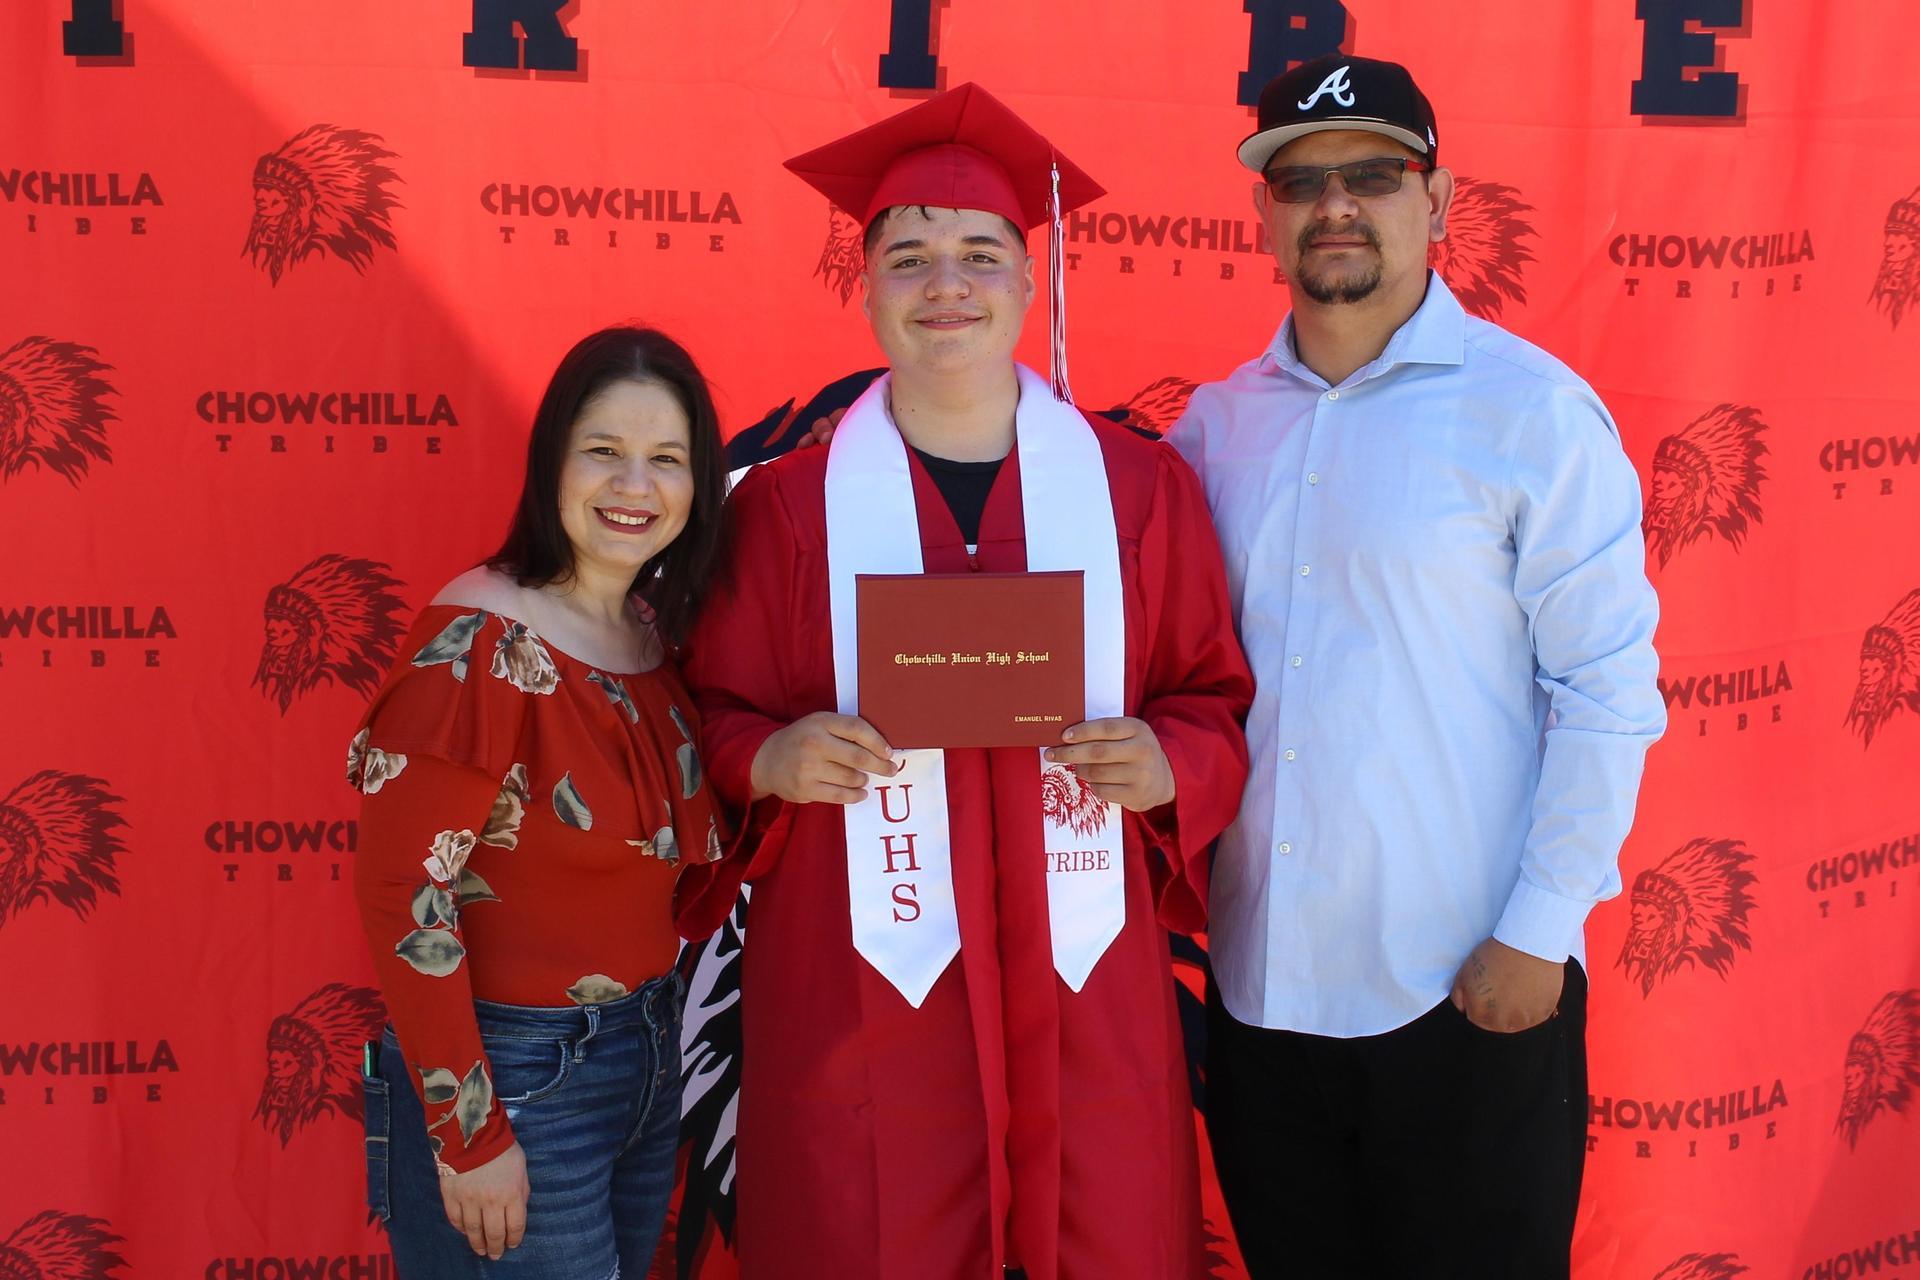 Emanuel Rivas and family